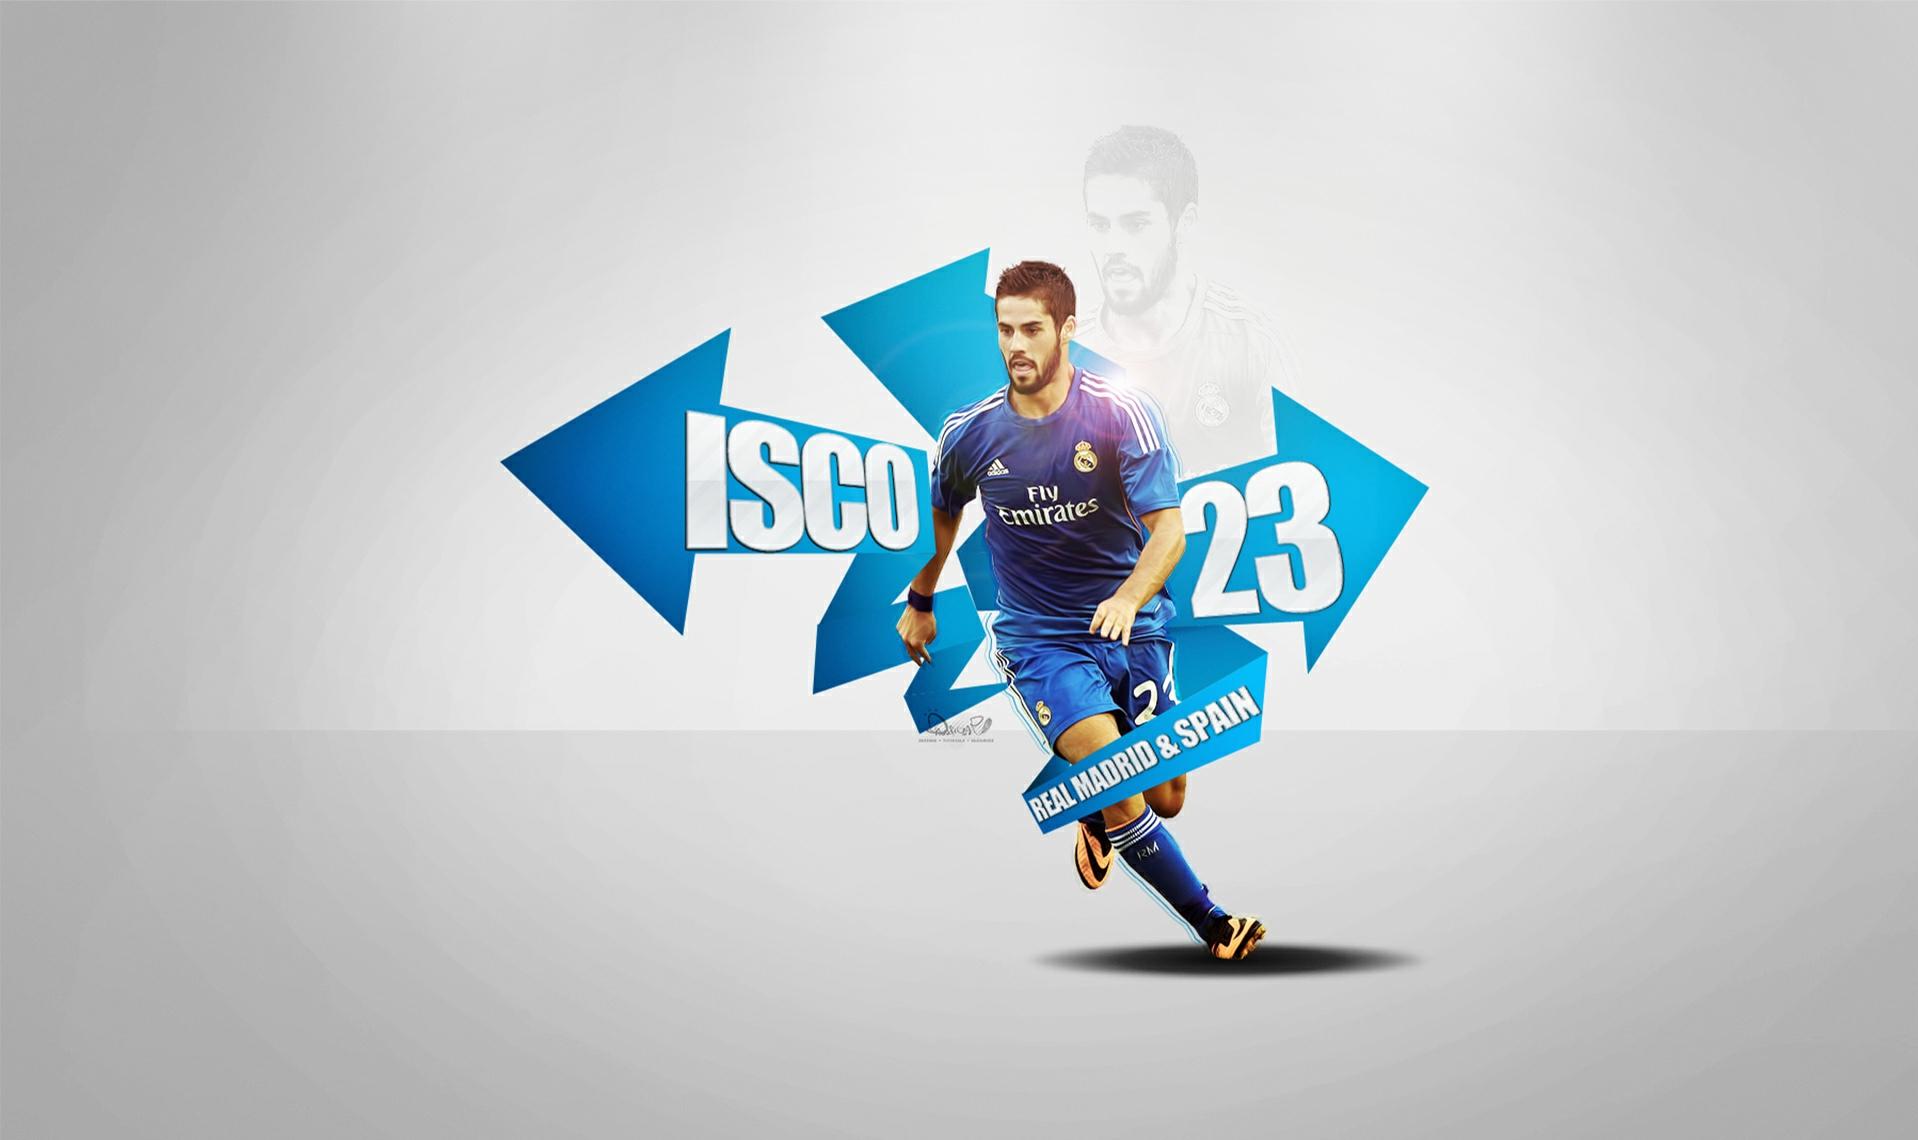 Wallpaper Illustration Logo Graphic Design Soccer